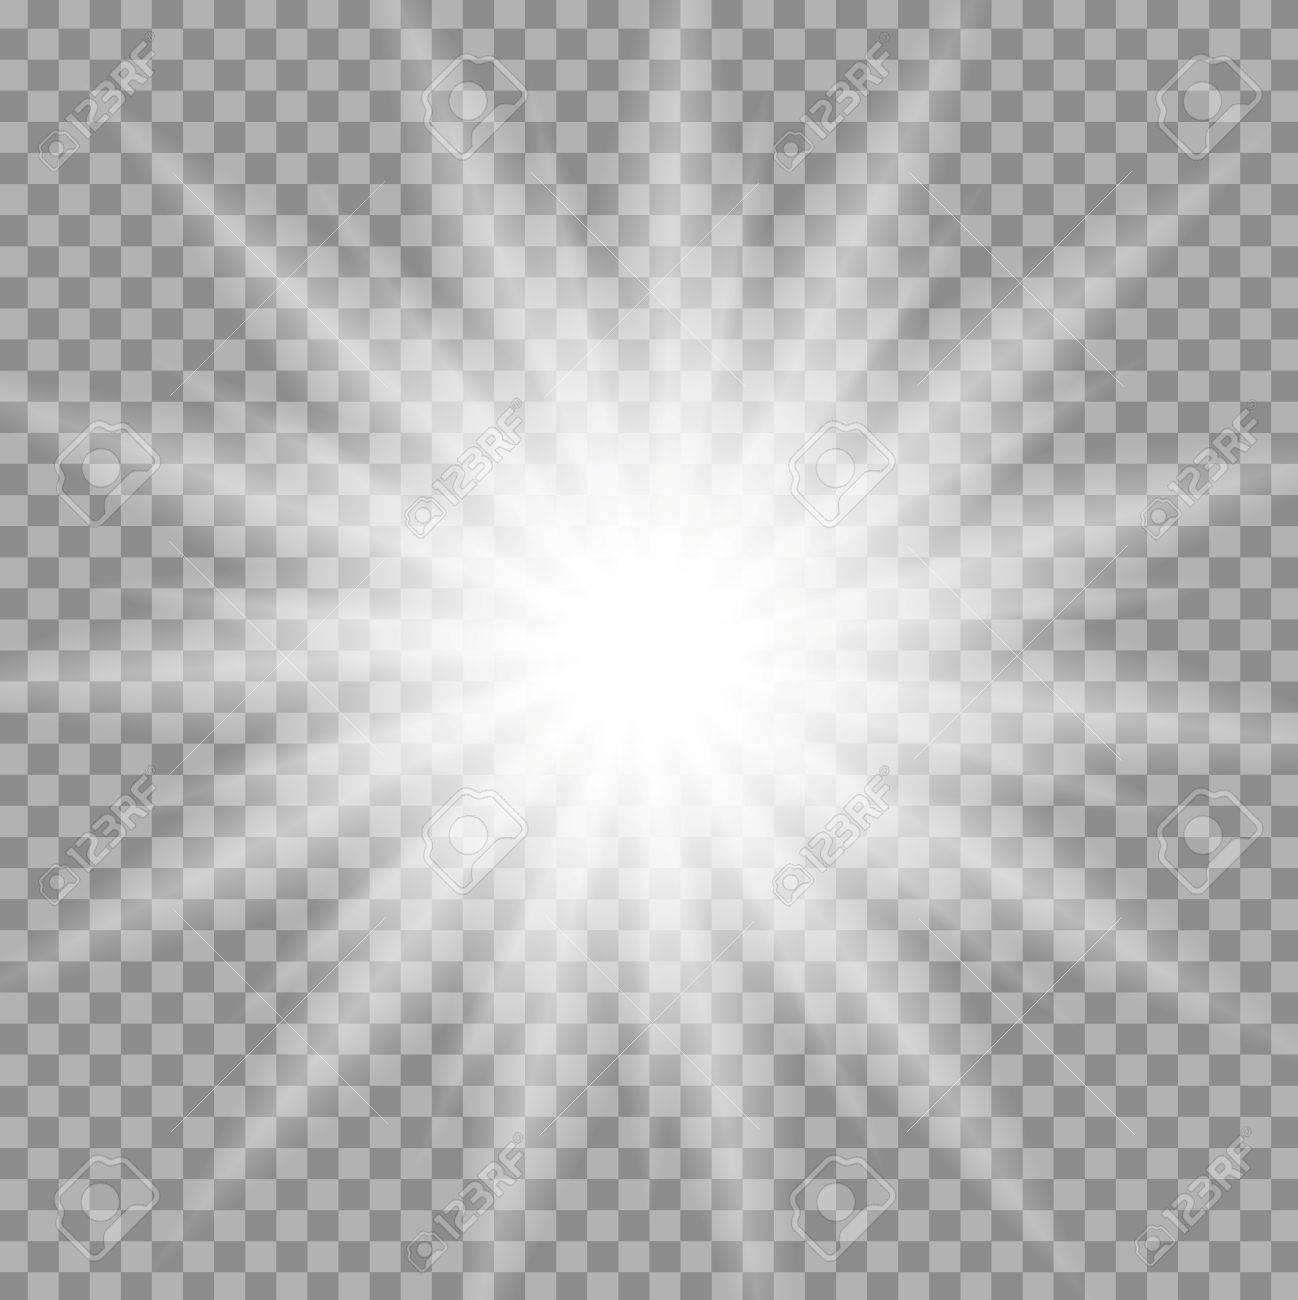 White Iridescent Light Effect Star Design. Shiny Transparent ... for Light Effects White Background  300lyp